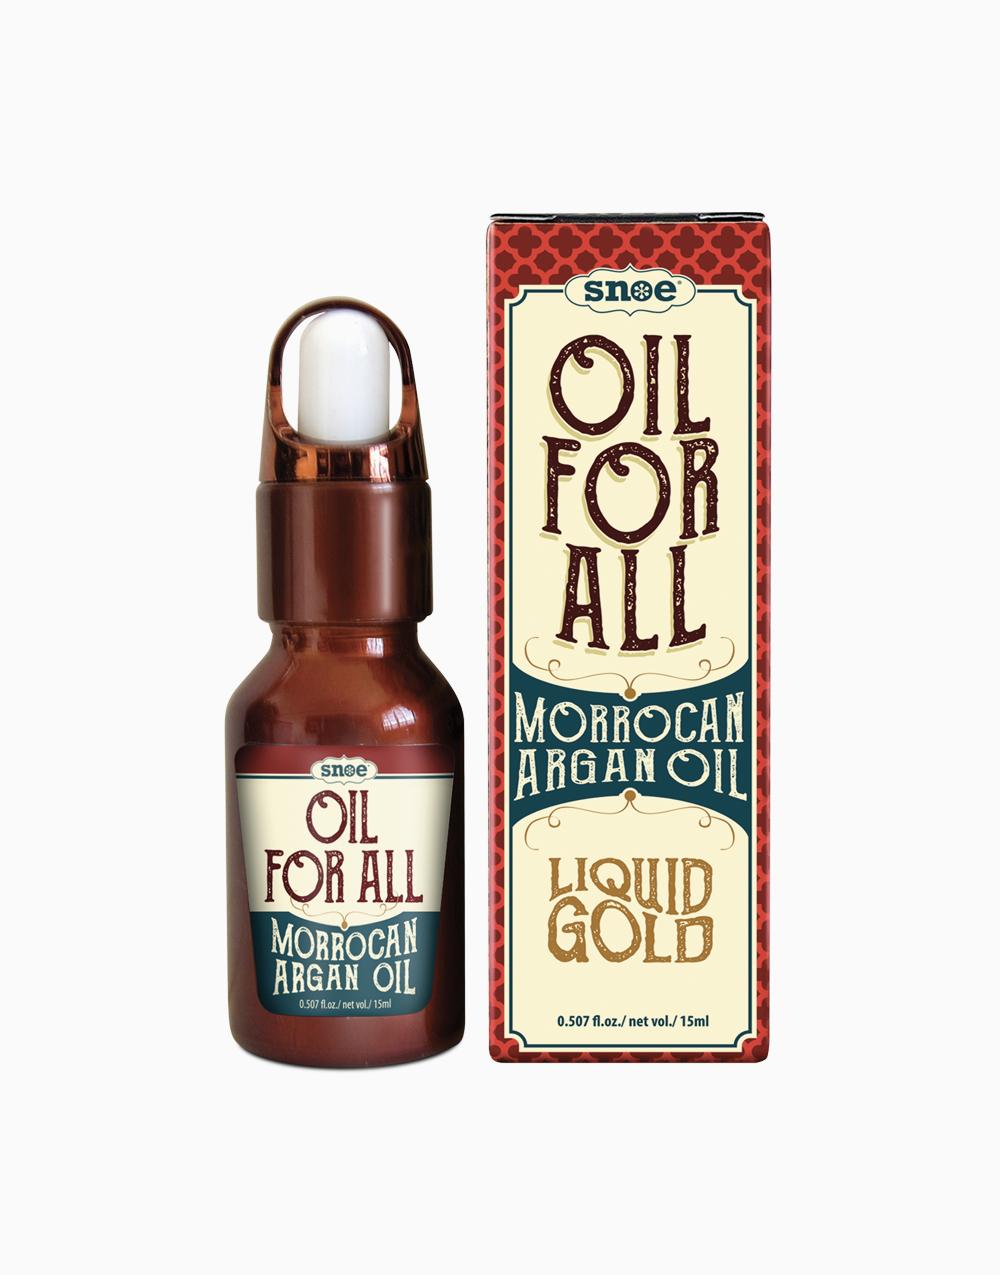 Oil For All Morrocan Argan Oil by Snoe Beauty